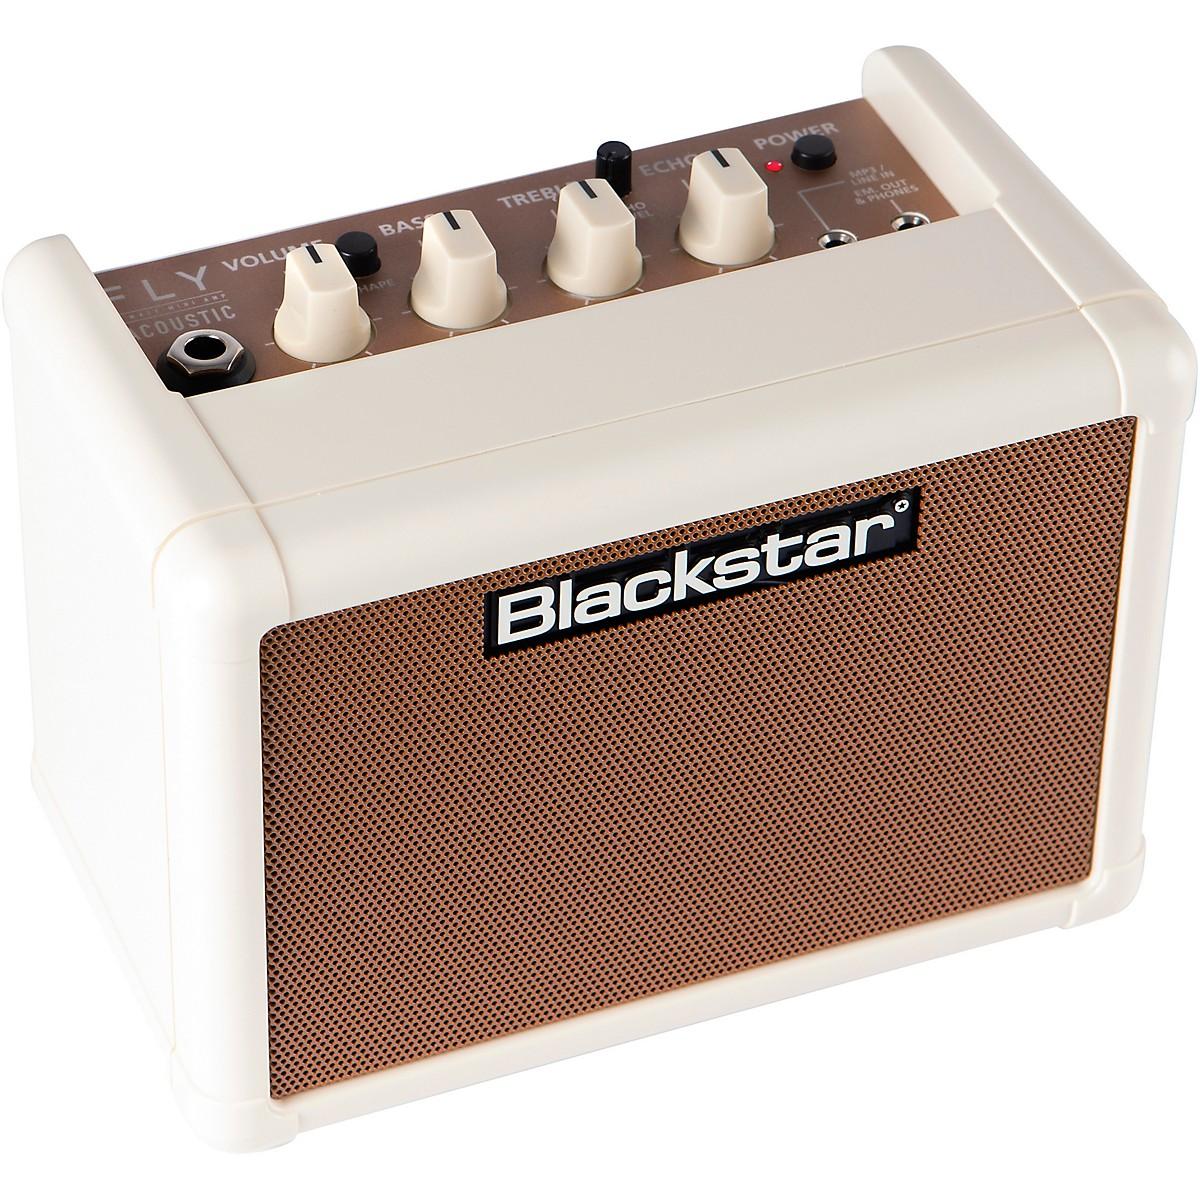 Blackstar Fly 3W Acoustic 3W 1x3 Acoustic Guitar Combo Amplifier